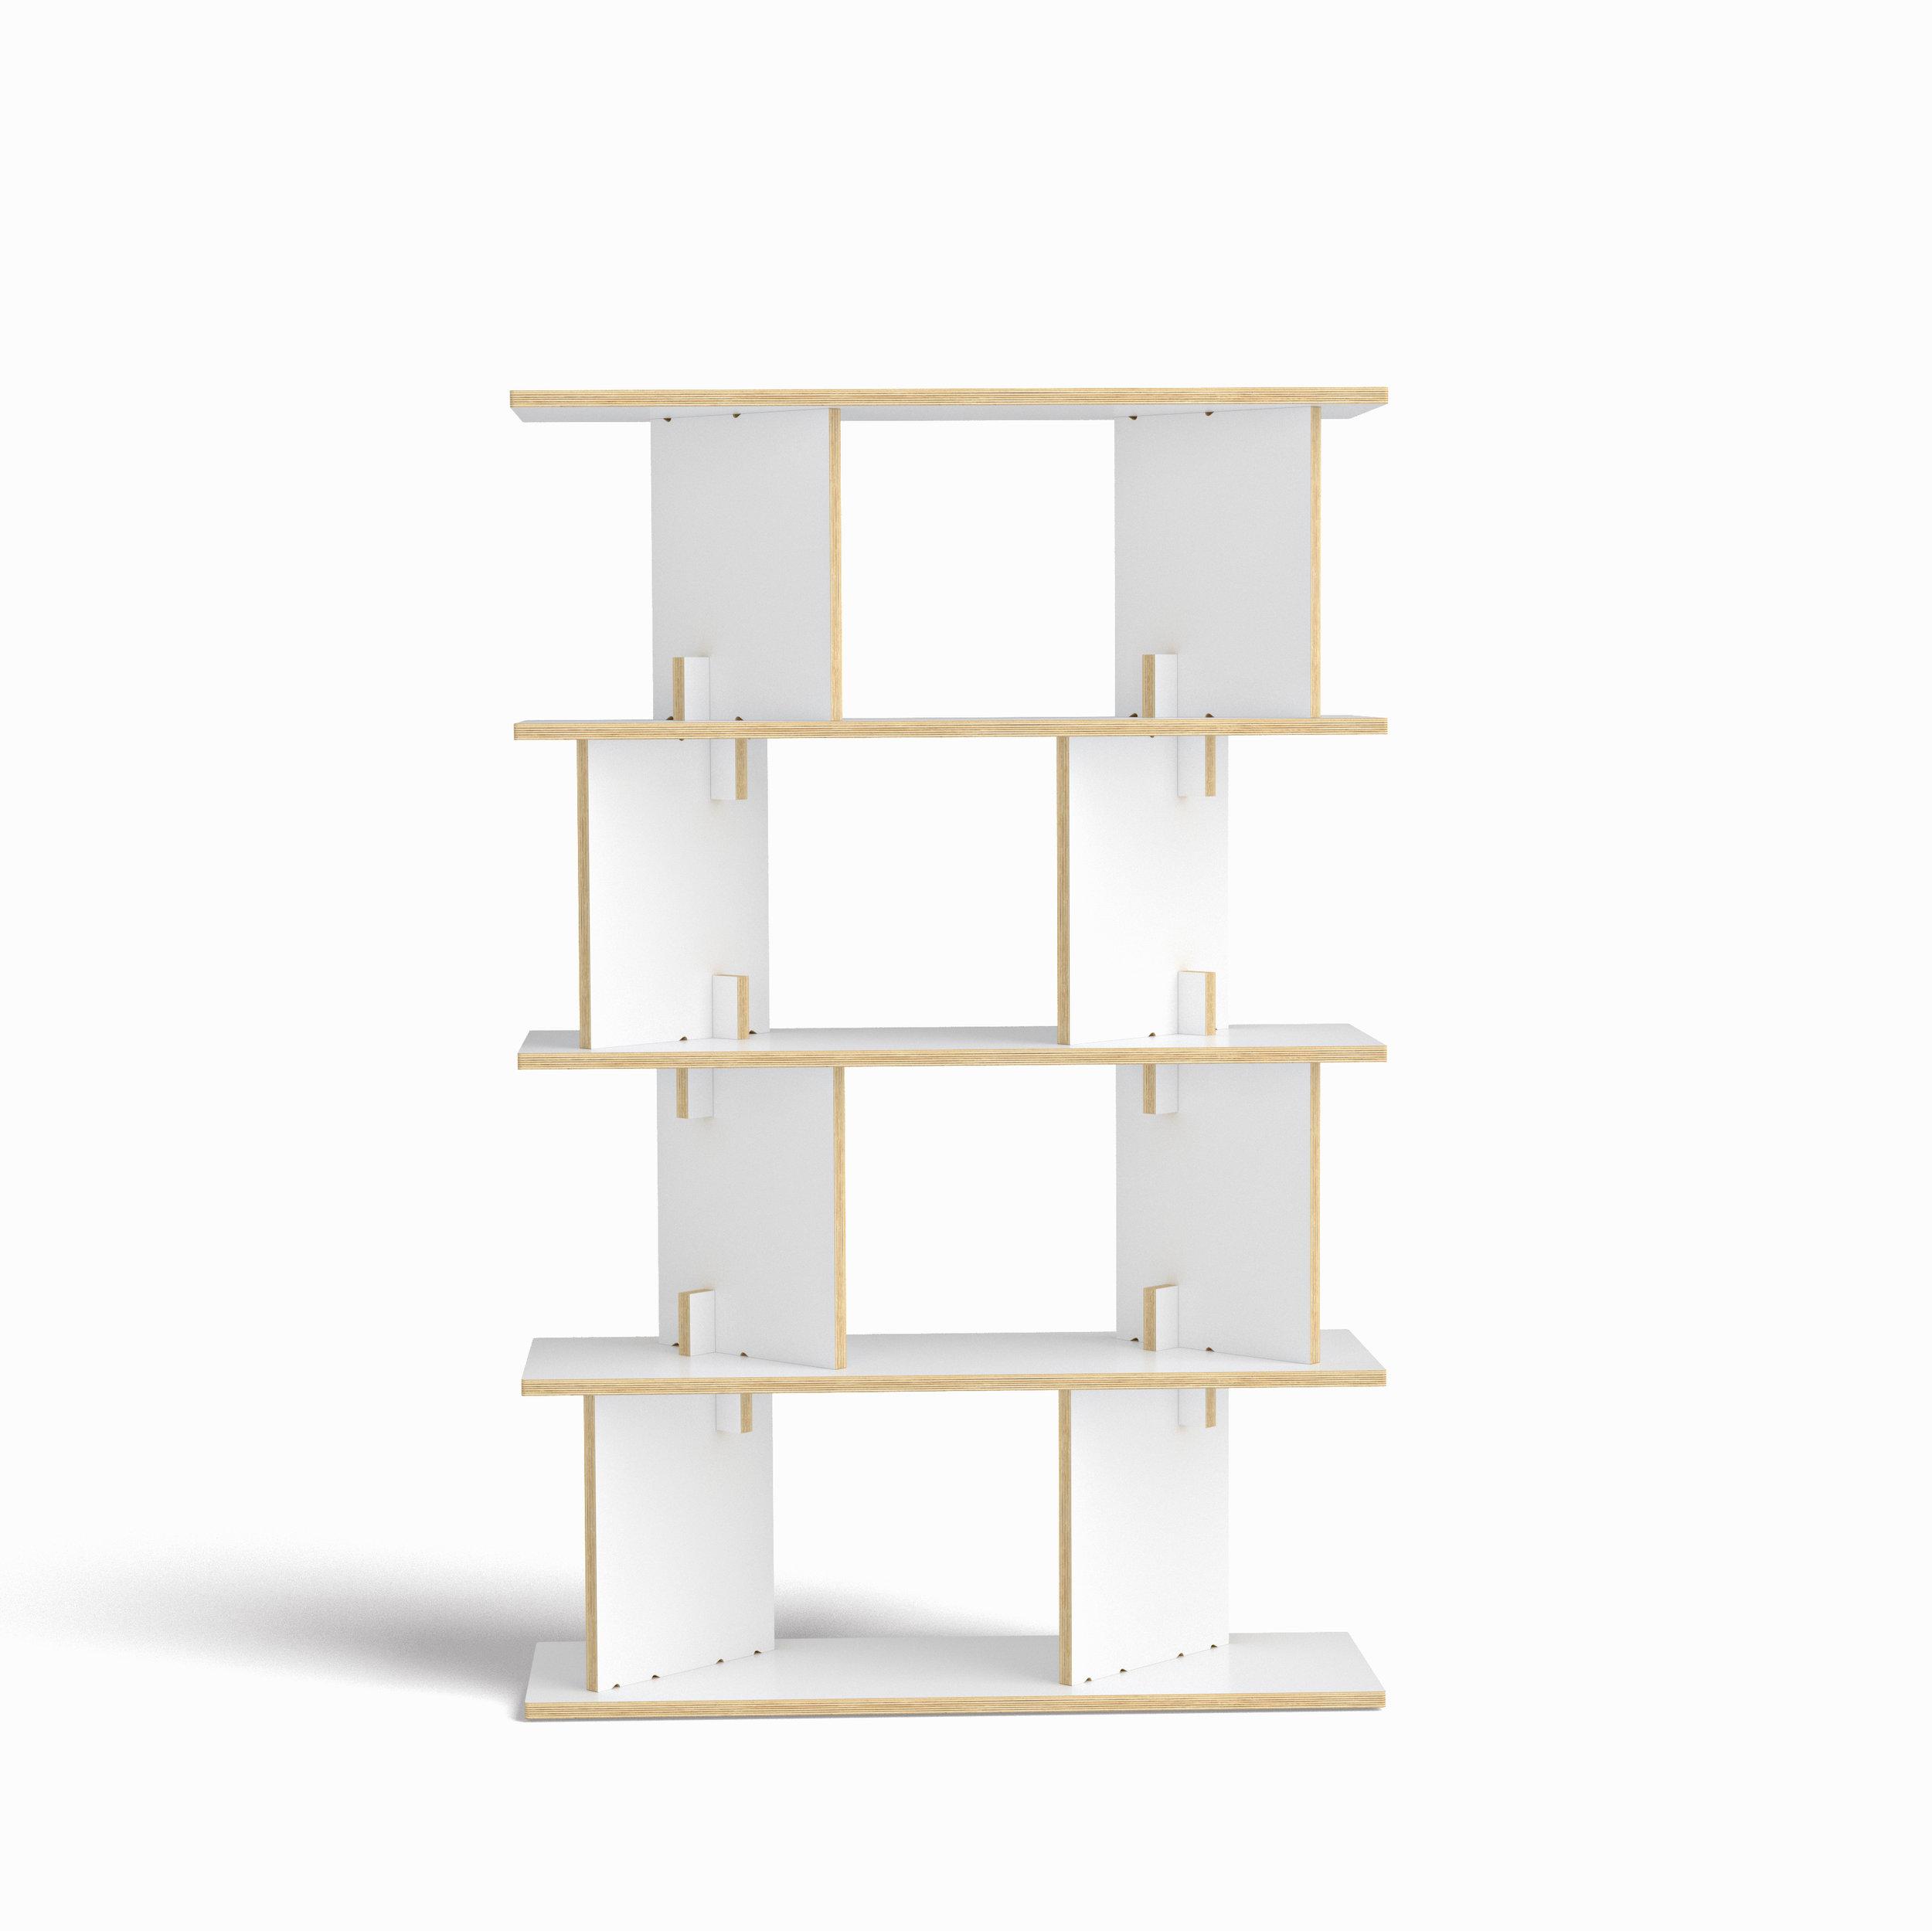 FIT_Neubau 95cm 5x30_ White_Front.jpg